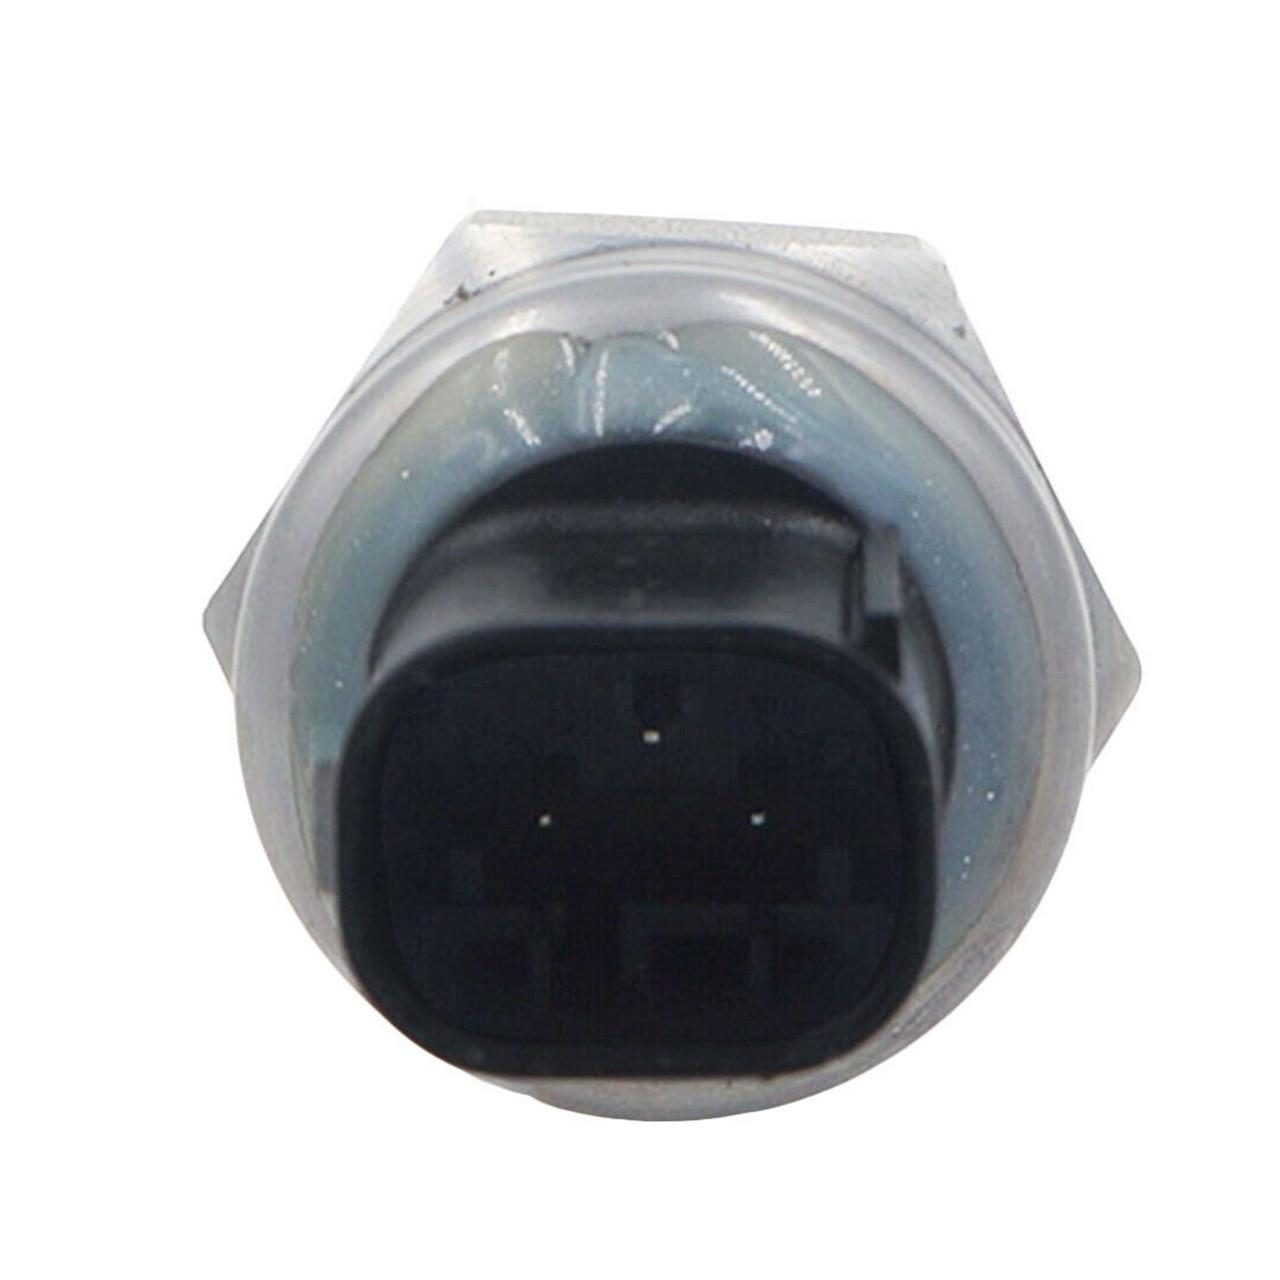 Brake ABS Pressure Sensor 55CP09-03 34521164458 For BMW E46 E60 E61 E64 Z4